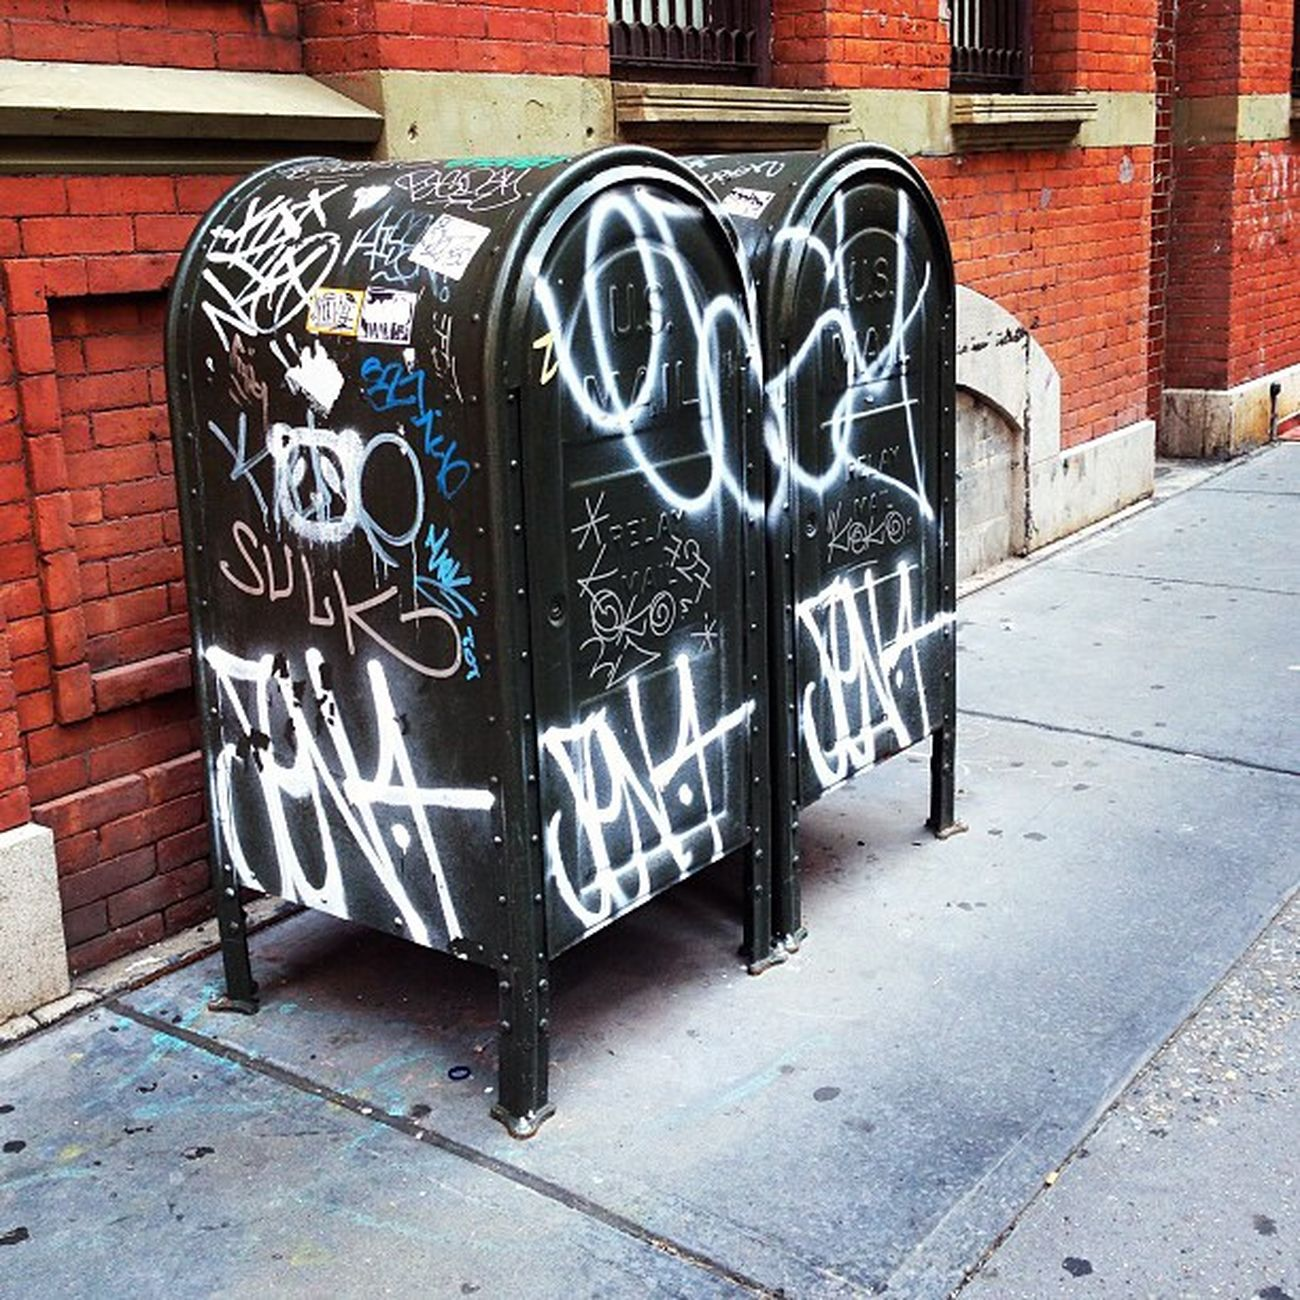 NYC NYC Photography NYC Street Photography Mailboxes Streetart Graffiti Art